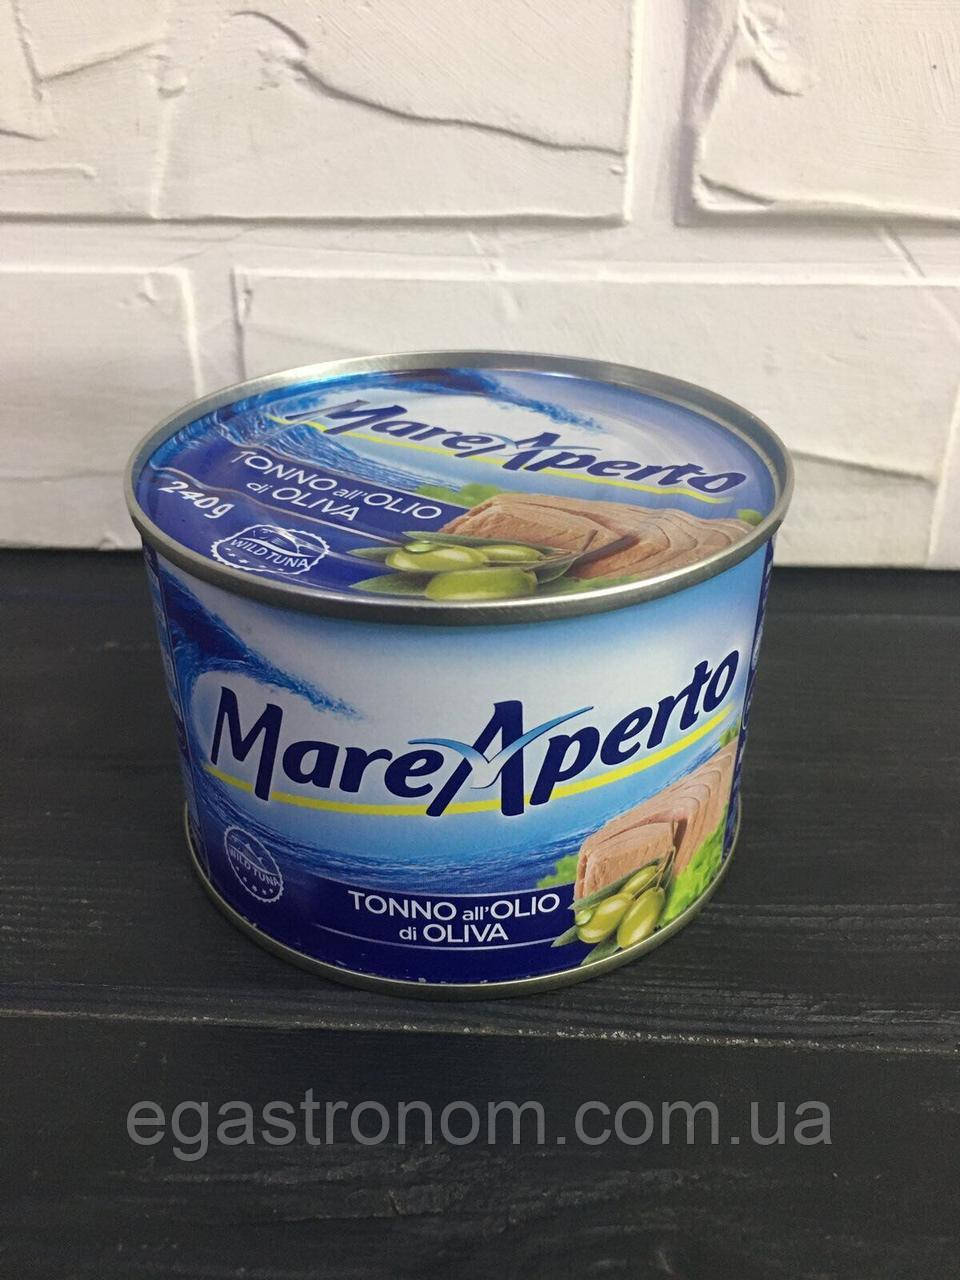 Тунець Маре Аперто в олив.олії Mare Aperto 240/156g 24шт/ящ (Код : 00-00003194)